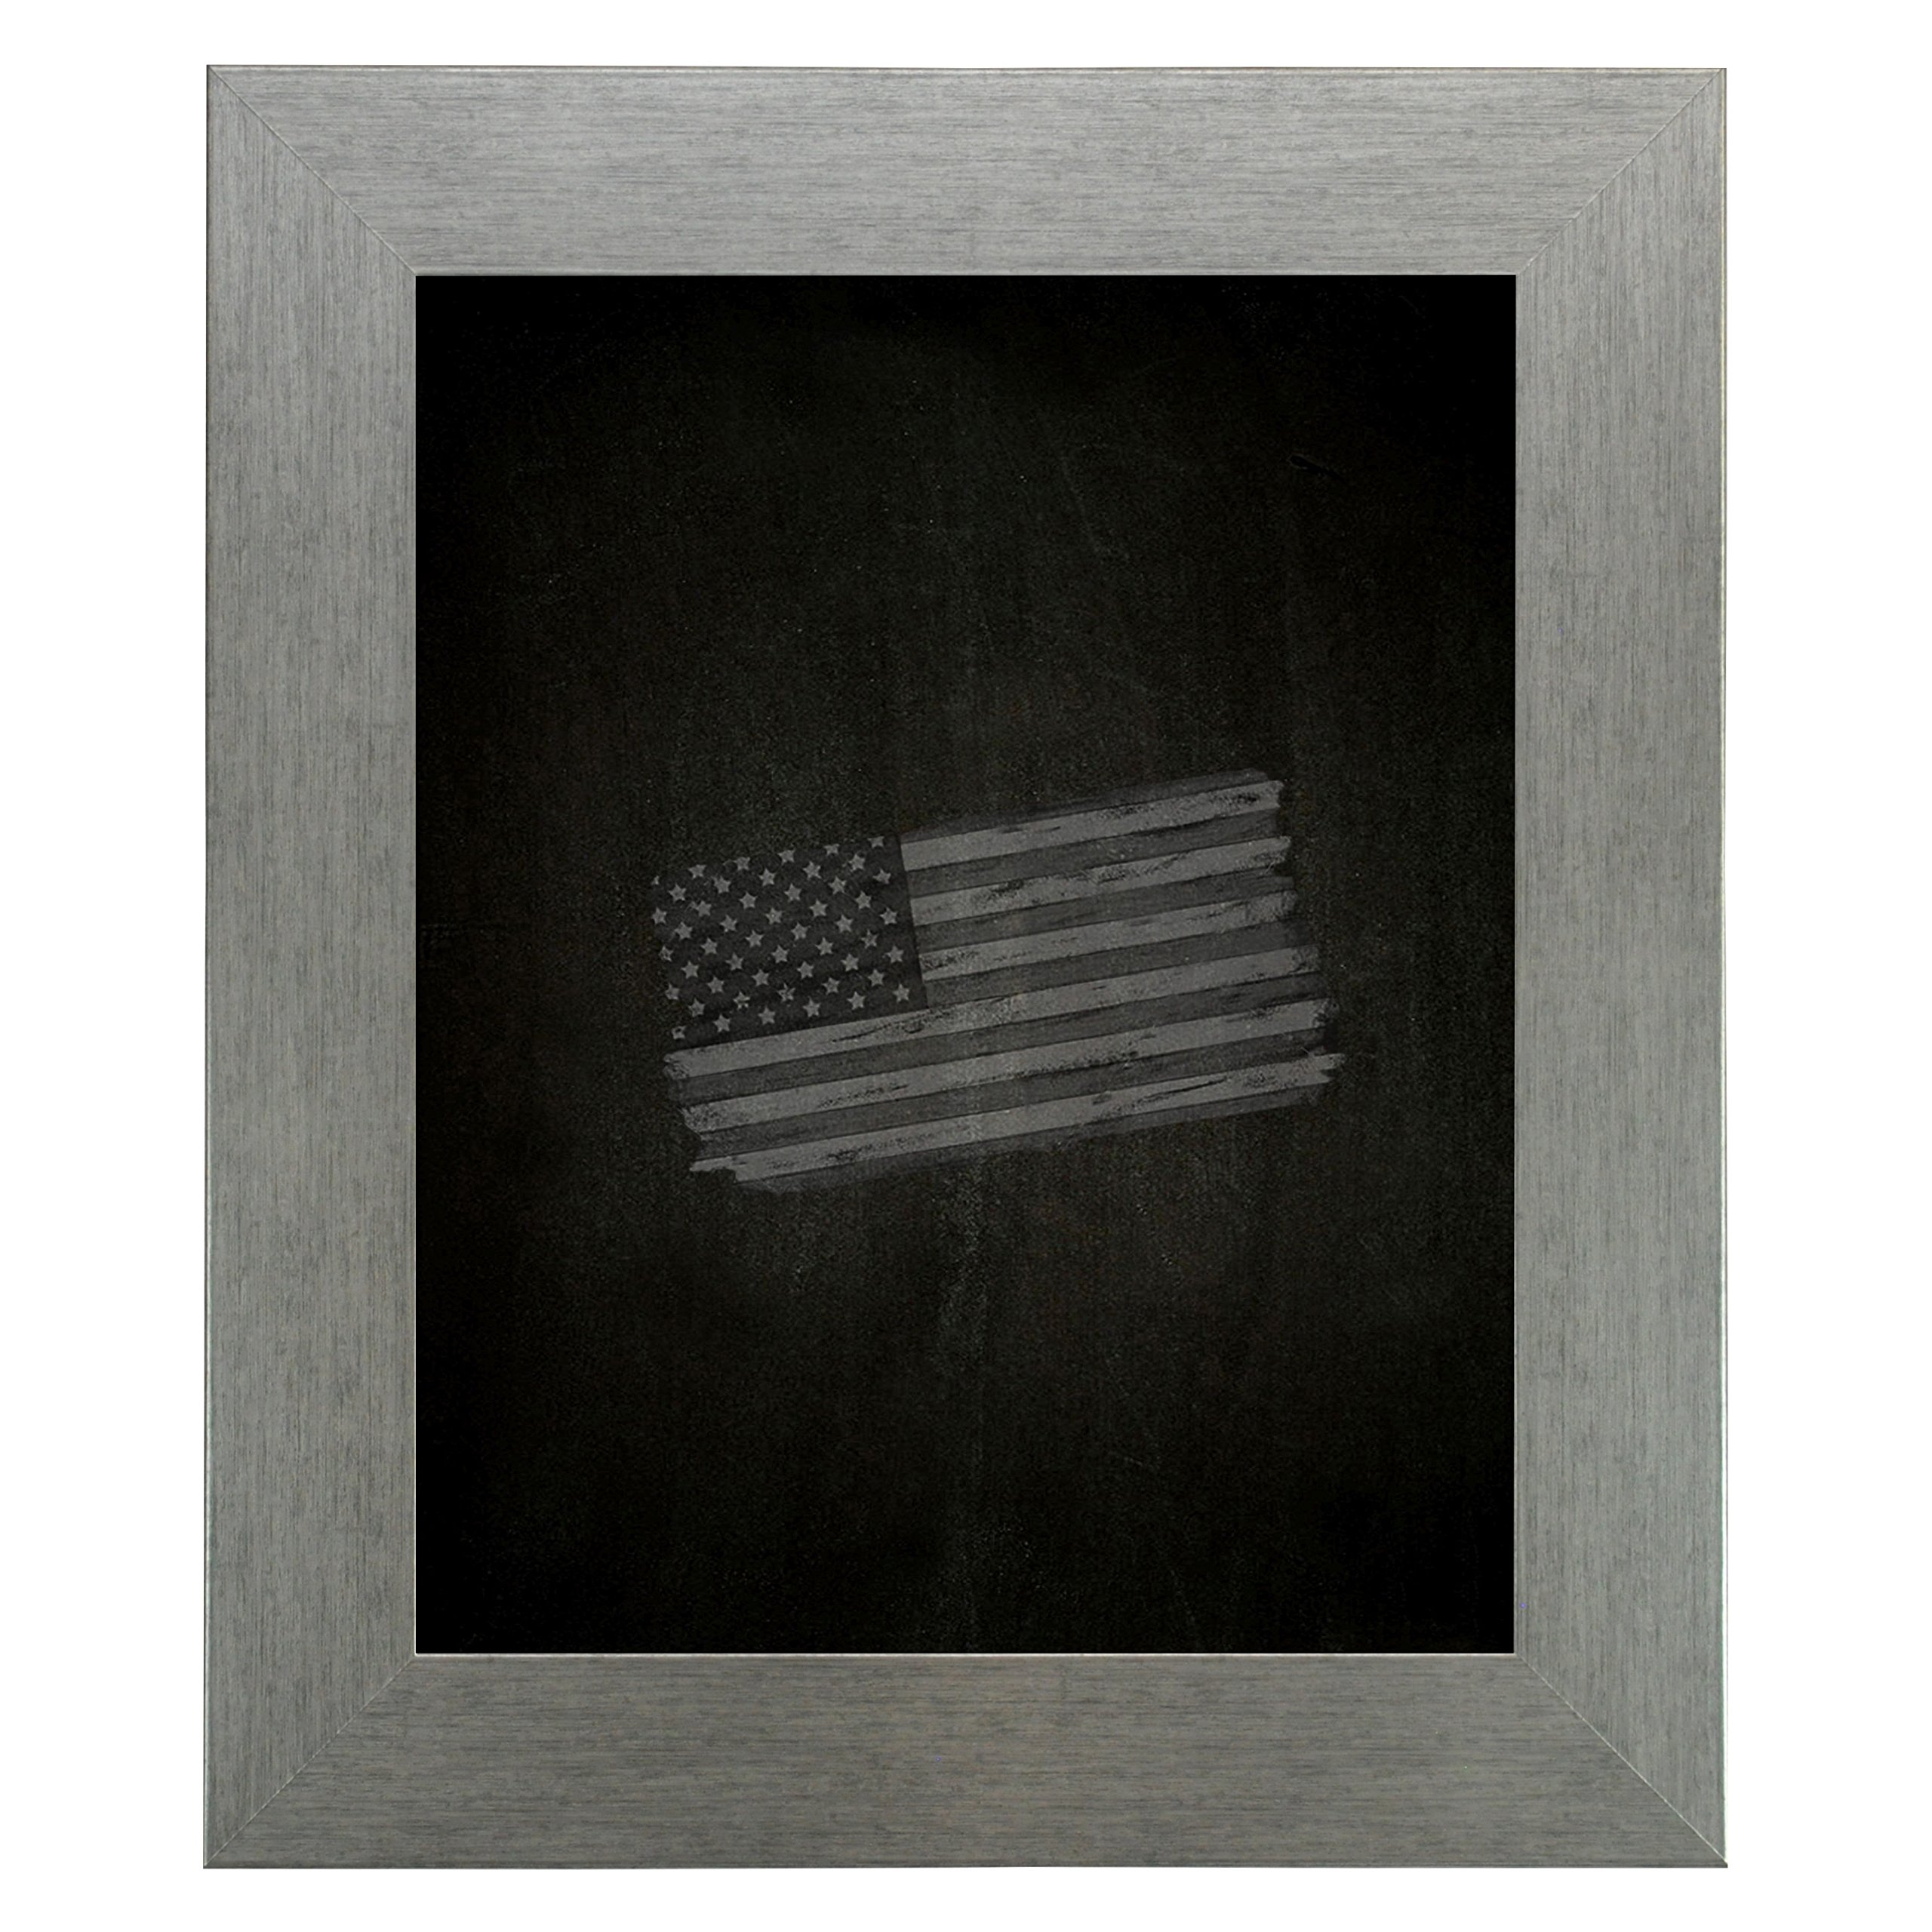 Rayne Mirrors American Made Rayne Yukon Silver Blackboard/ Chalkboard Exterior Size: 24 x 66 by Rayne Mirrors